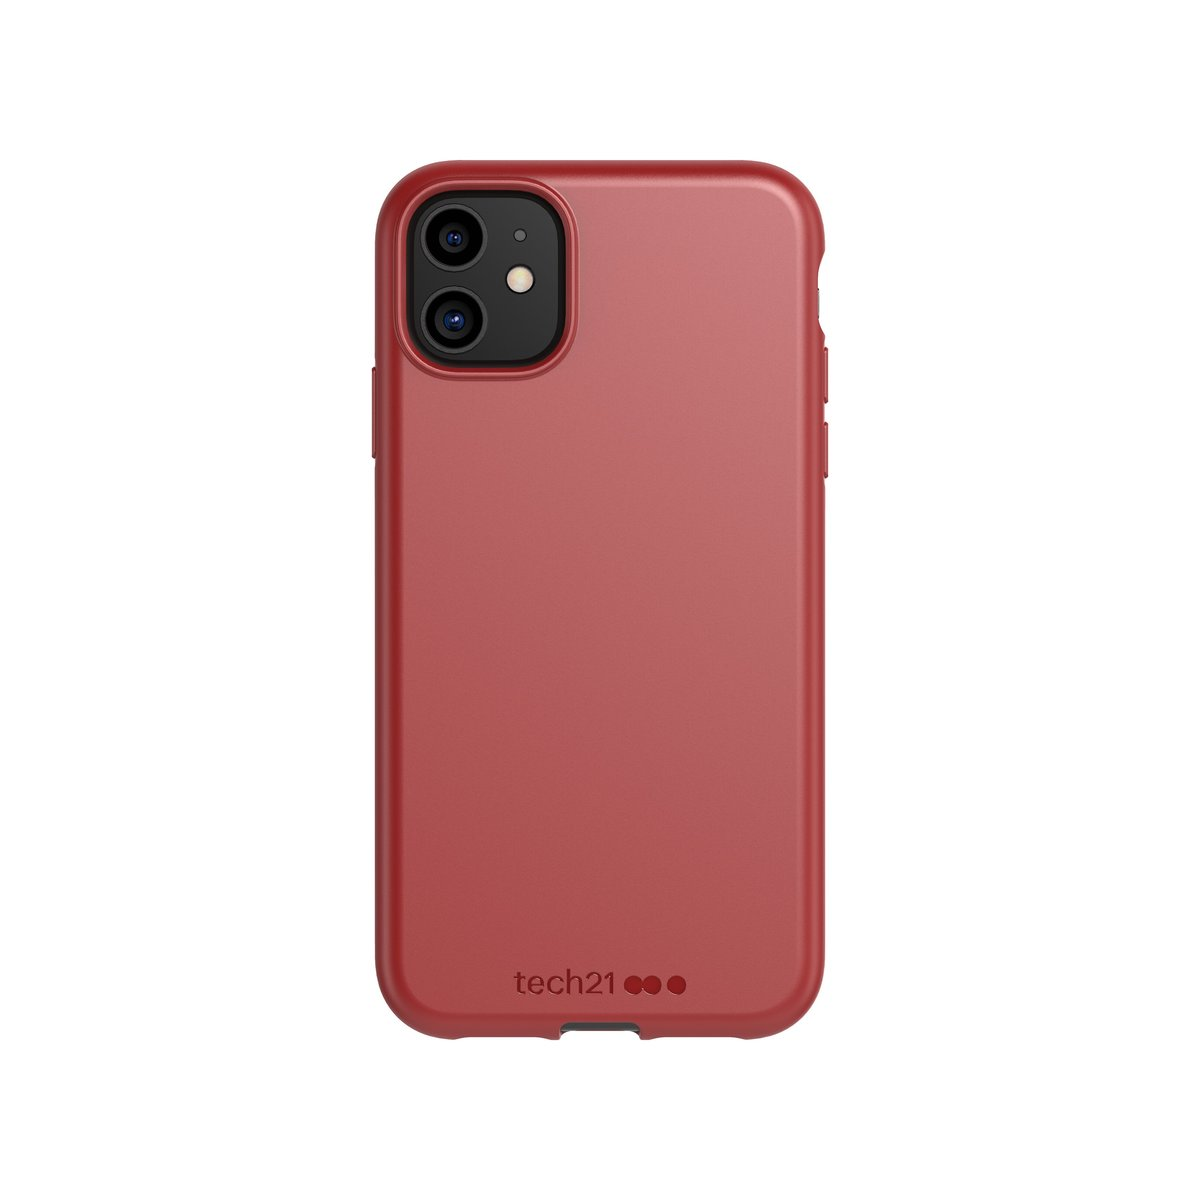 Studio Colour for iPhone 11 - Terra Red